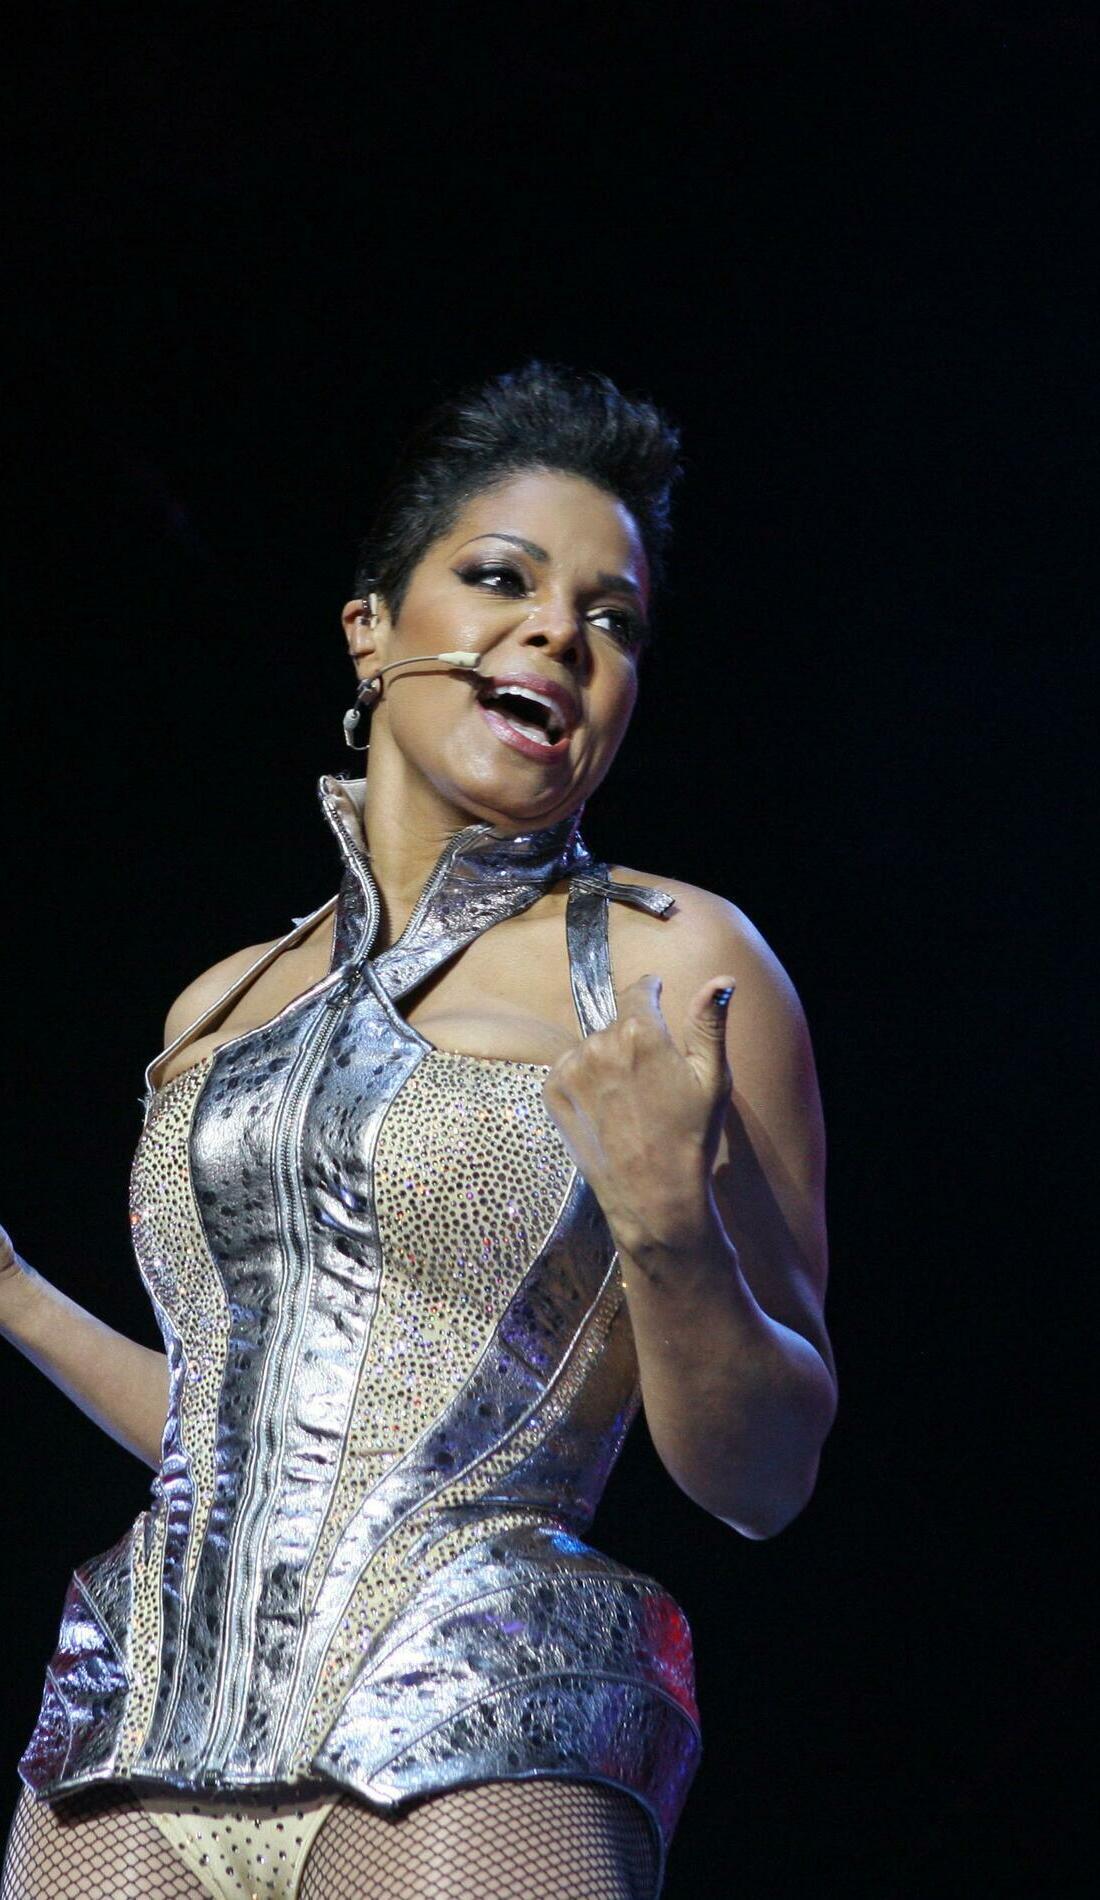 A Janet Jackson live event